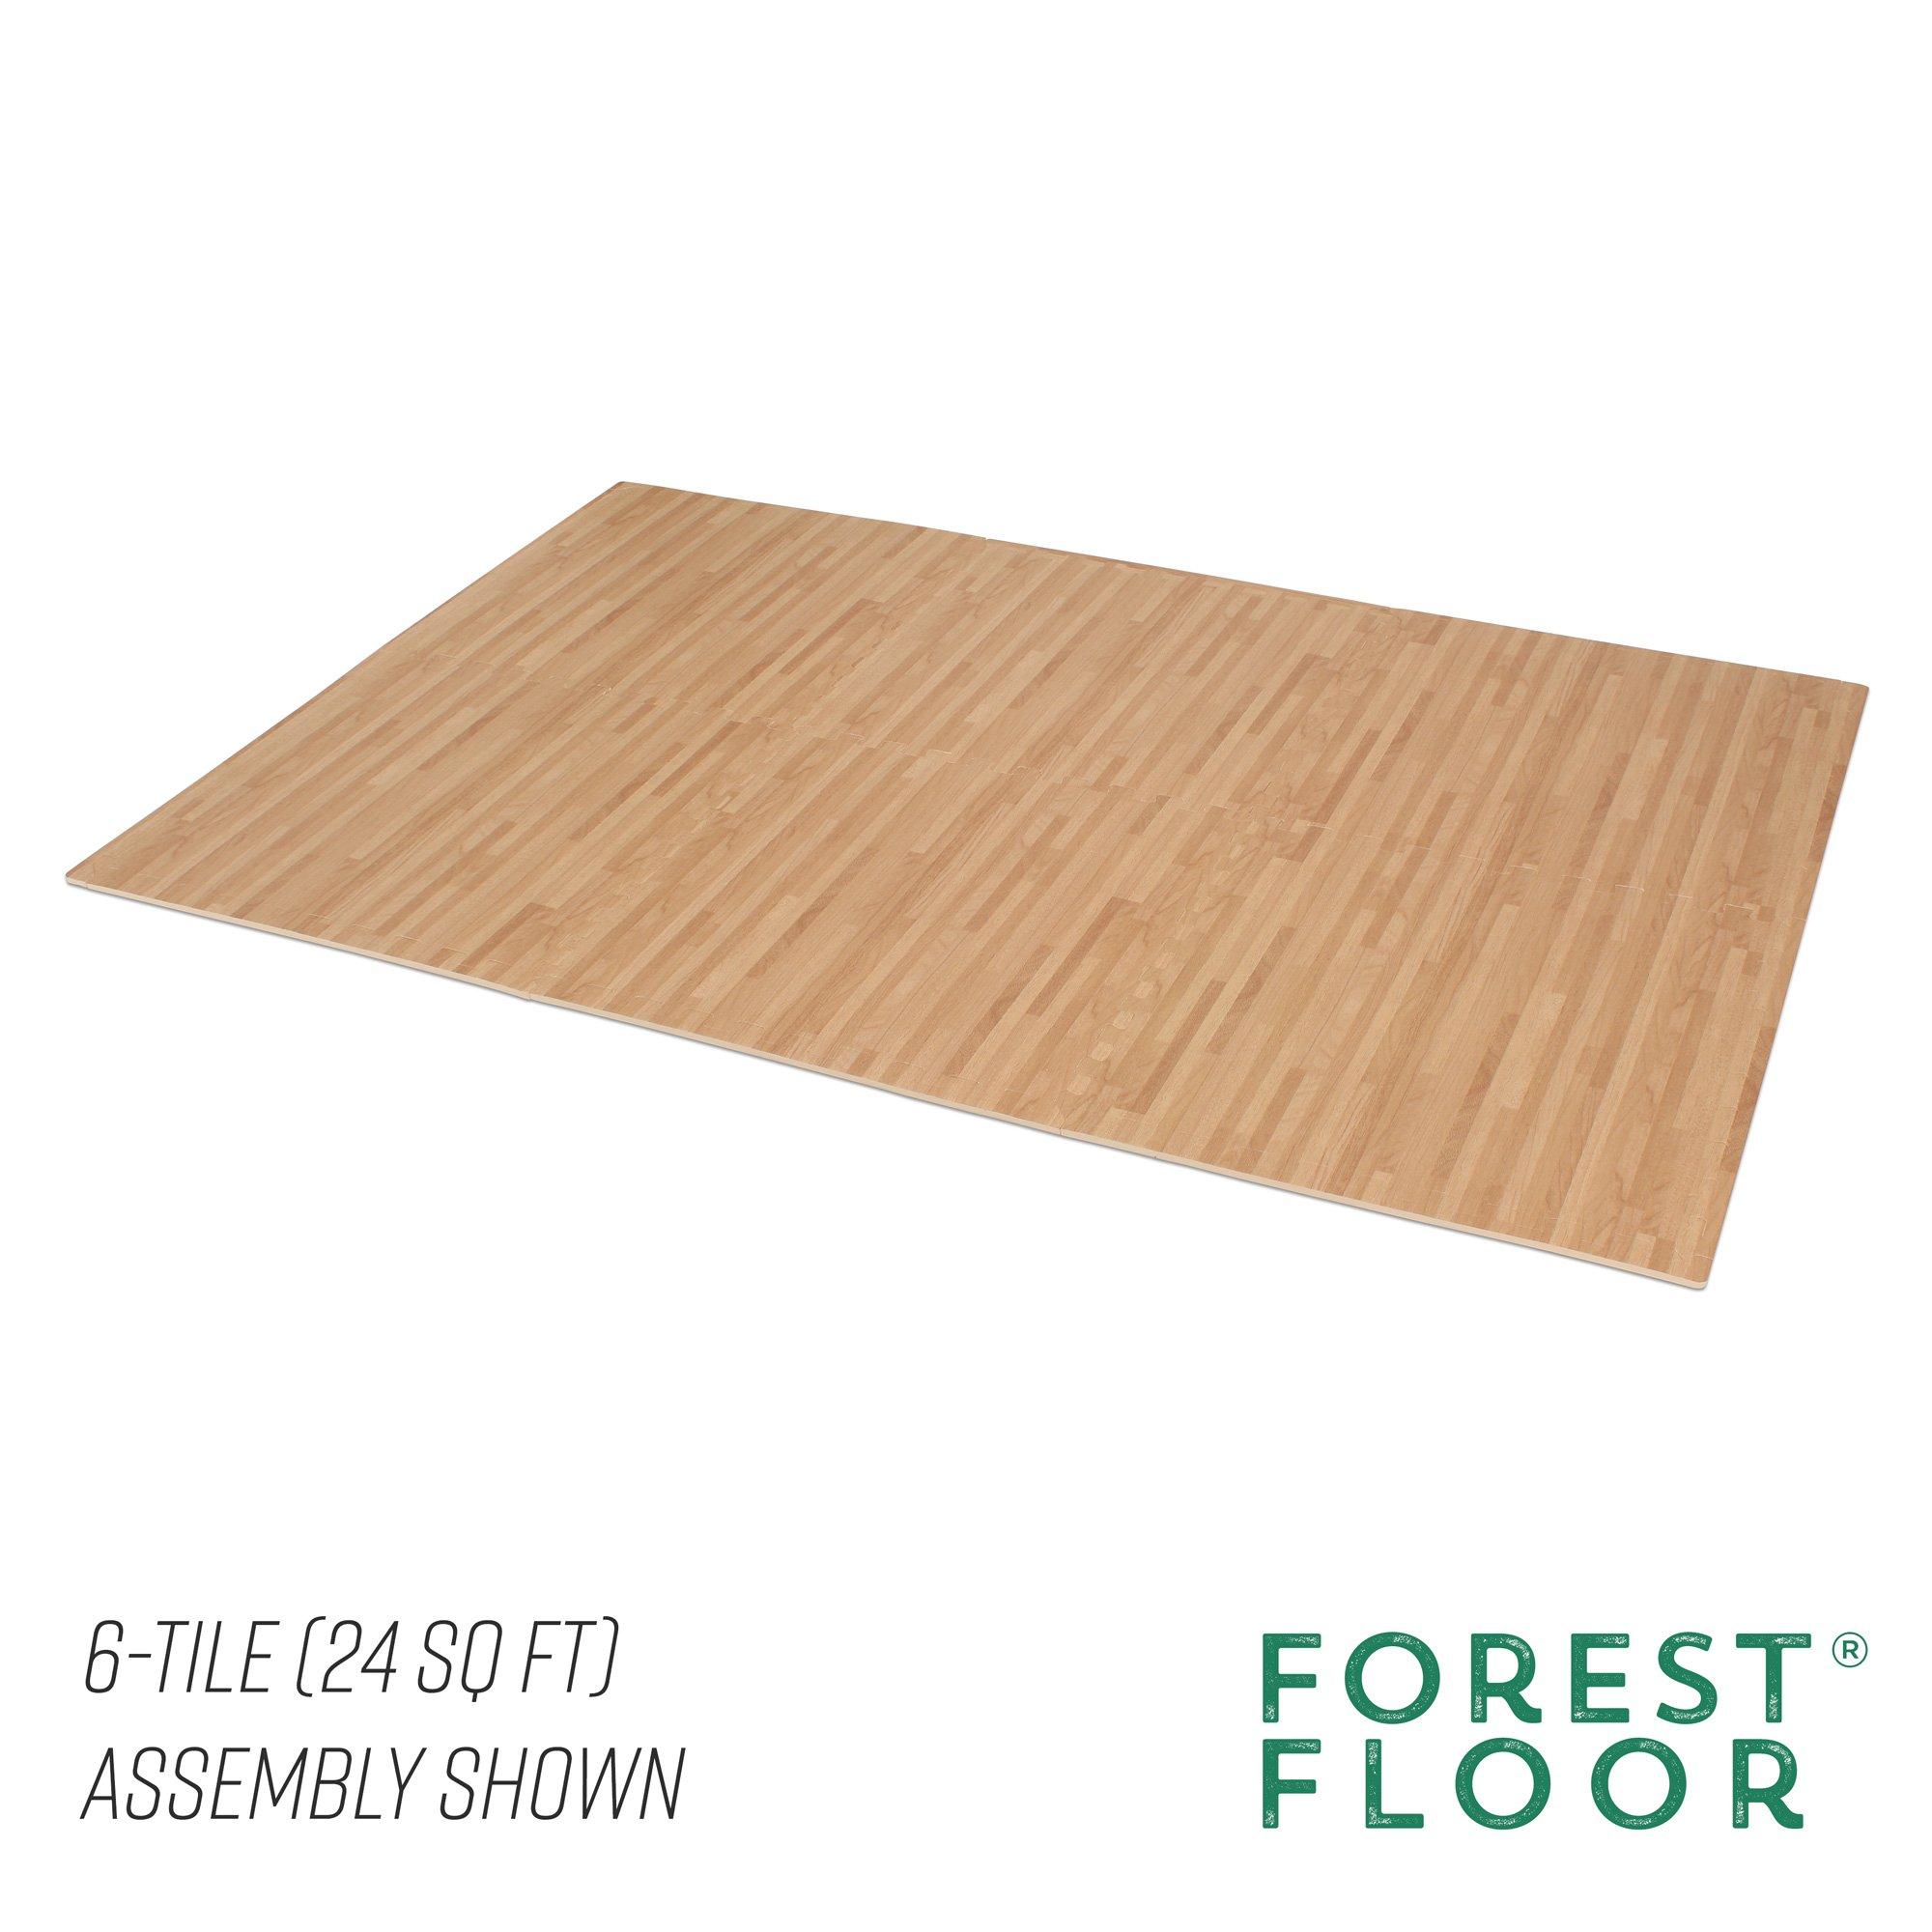 Forest Floor 3/8'' Thick Printed Wood Grain Interlocking Foam Floor Mats, 16 Sq Ft (4 Tiles), White Oak by Forest Floor (Image #5)